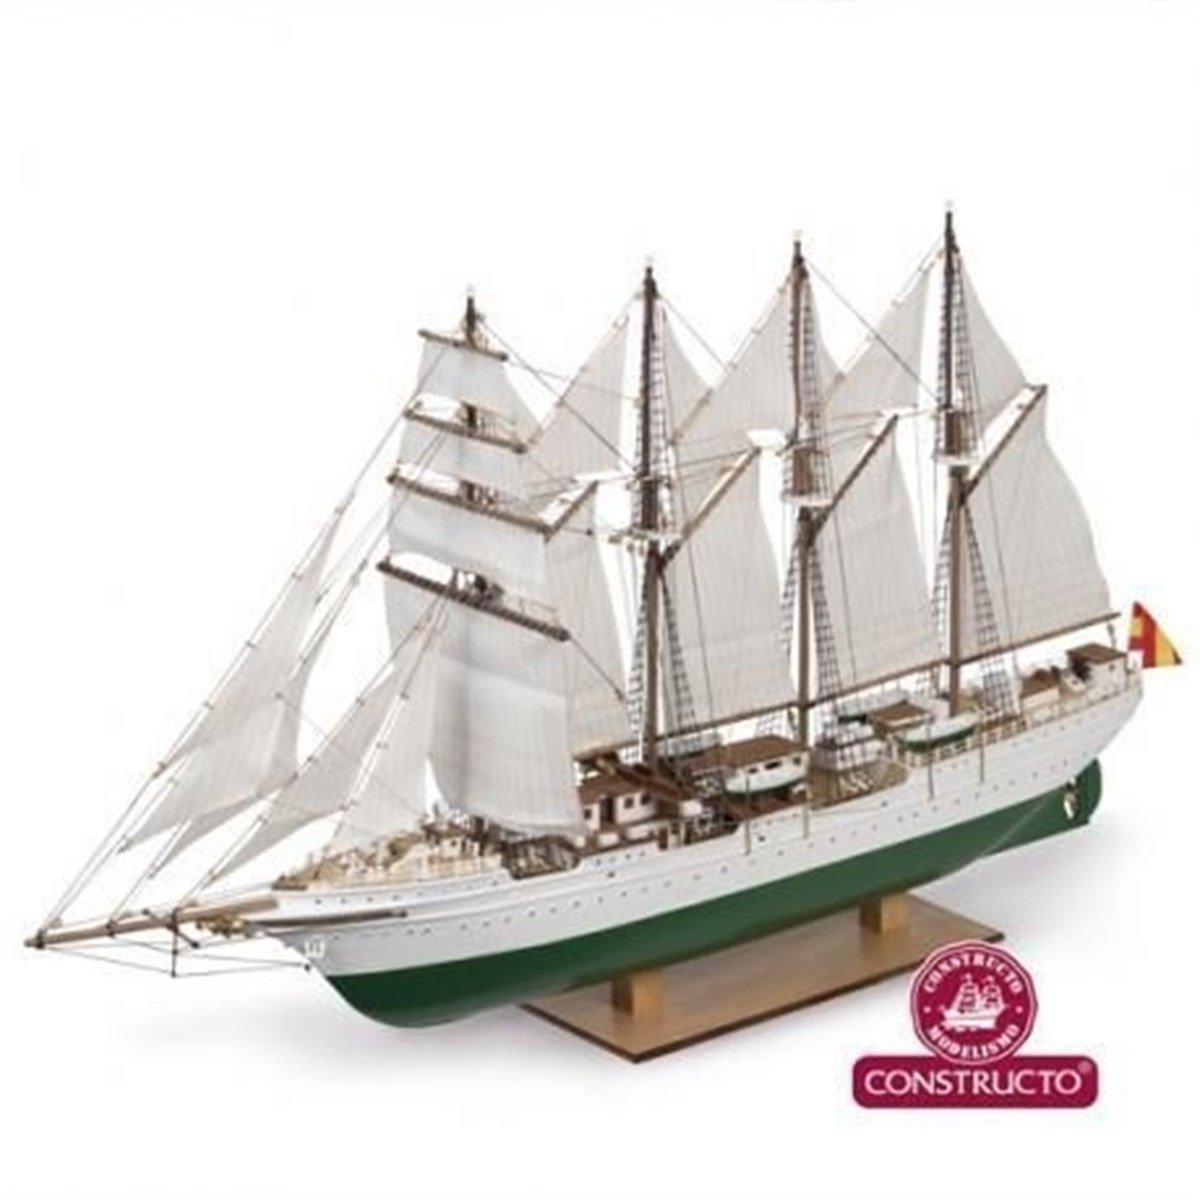 Constructo – 80622 – J. S. Elcano – Echelle 1/205